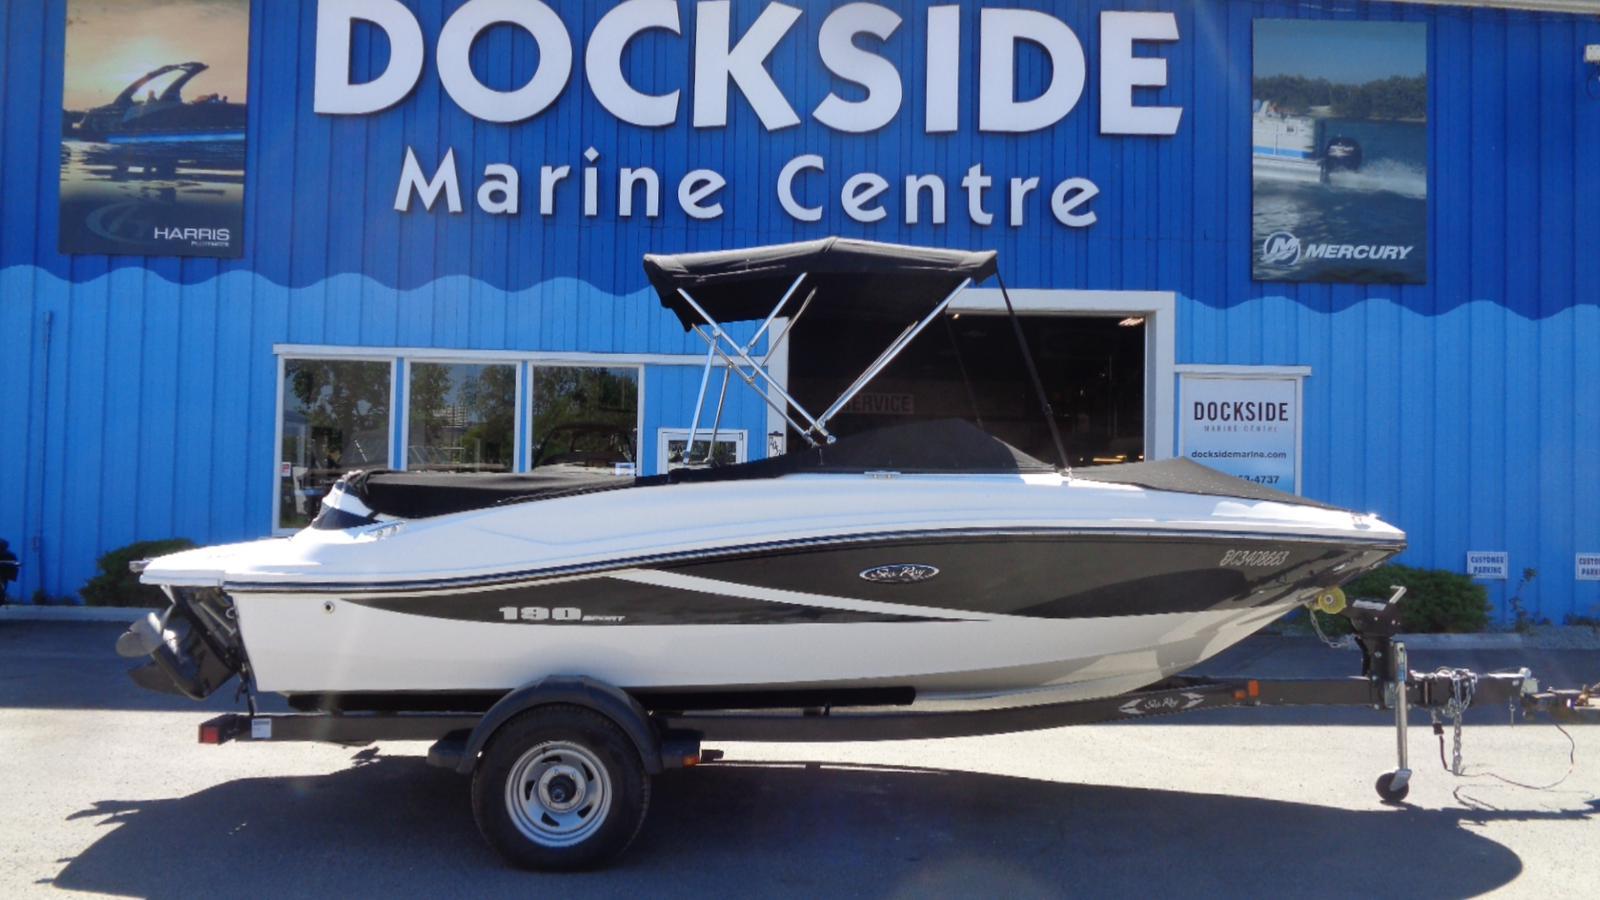 For Sale: 2012 Sea Ray 190 Sport 19ft<br/>Dockside Marine Centre, LTD.